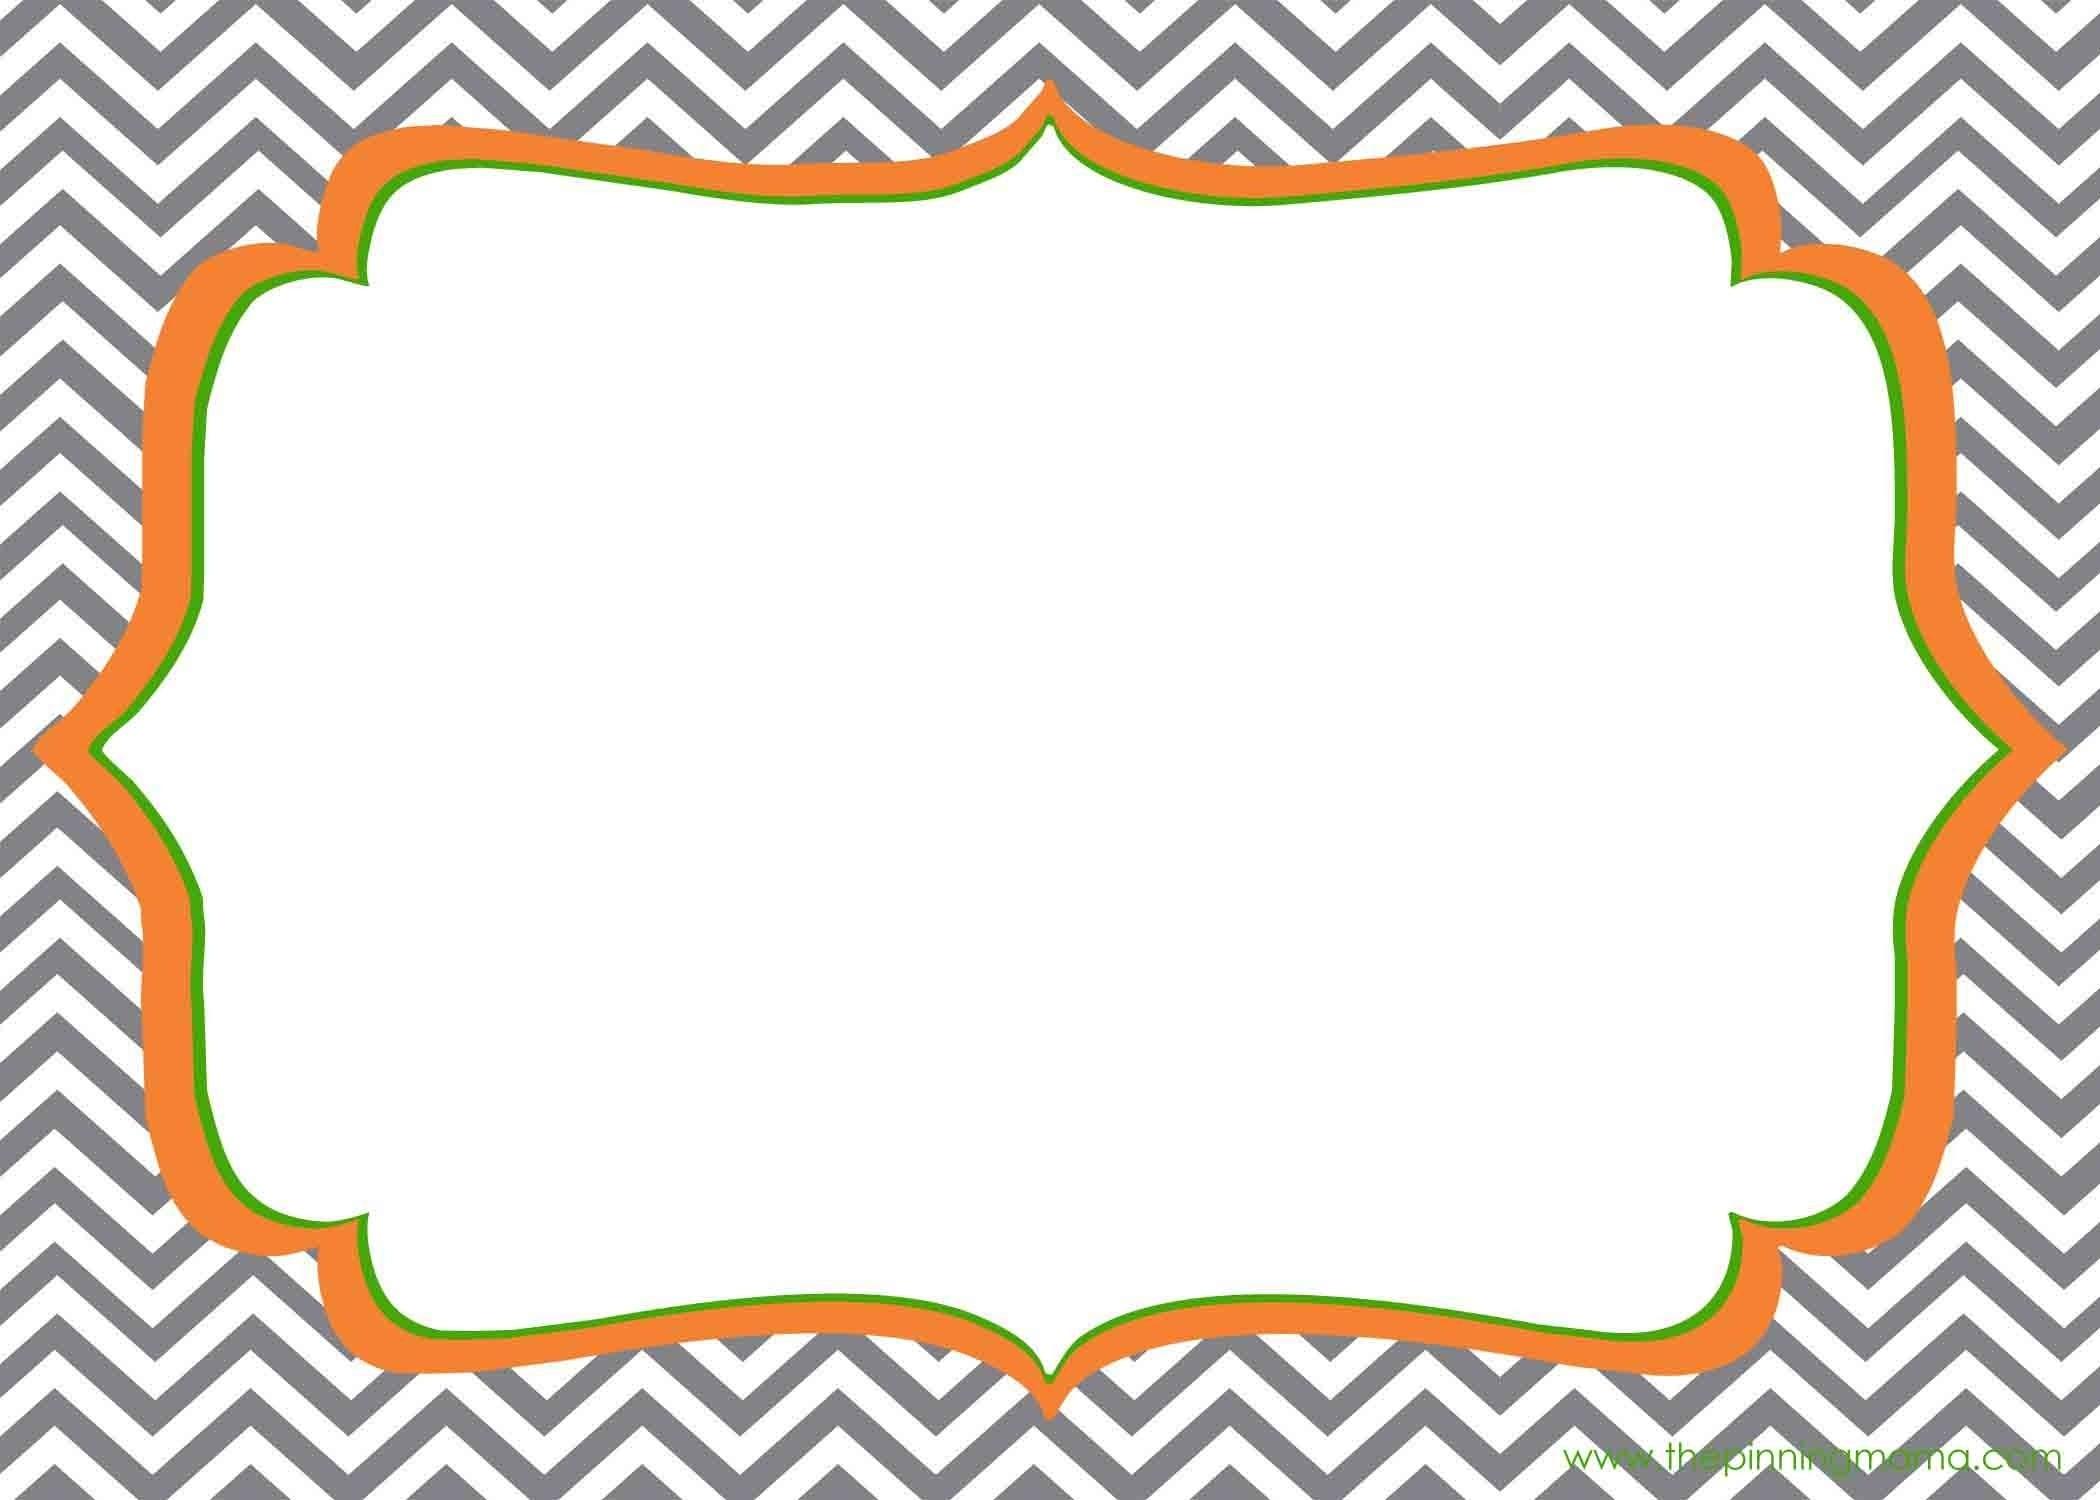 Free Printable Baby Cards Templates - Printable Cards - Free Printable Baby Cards